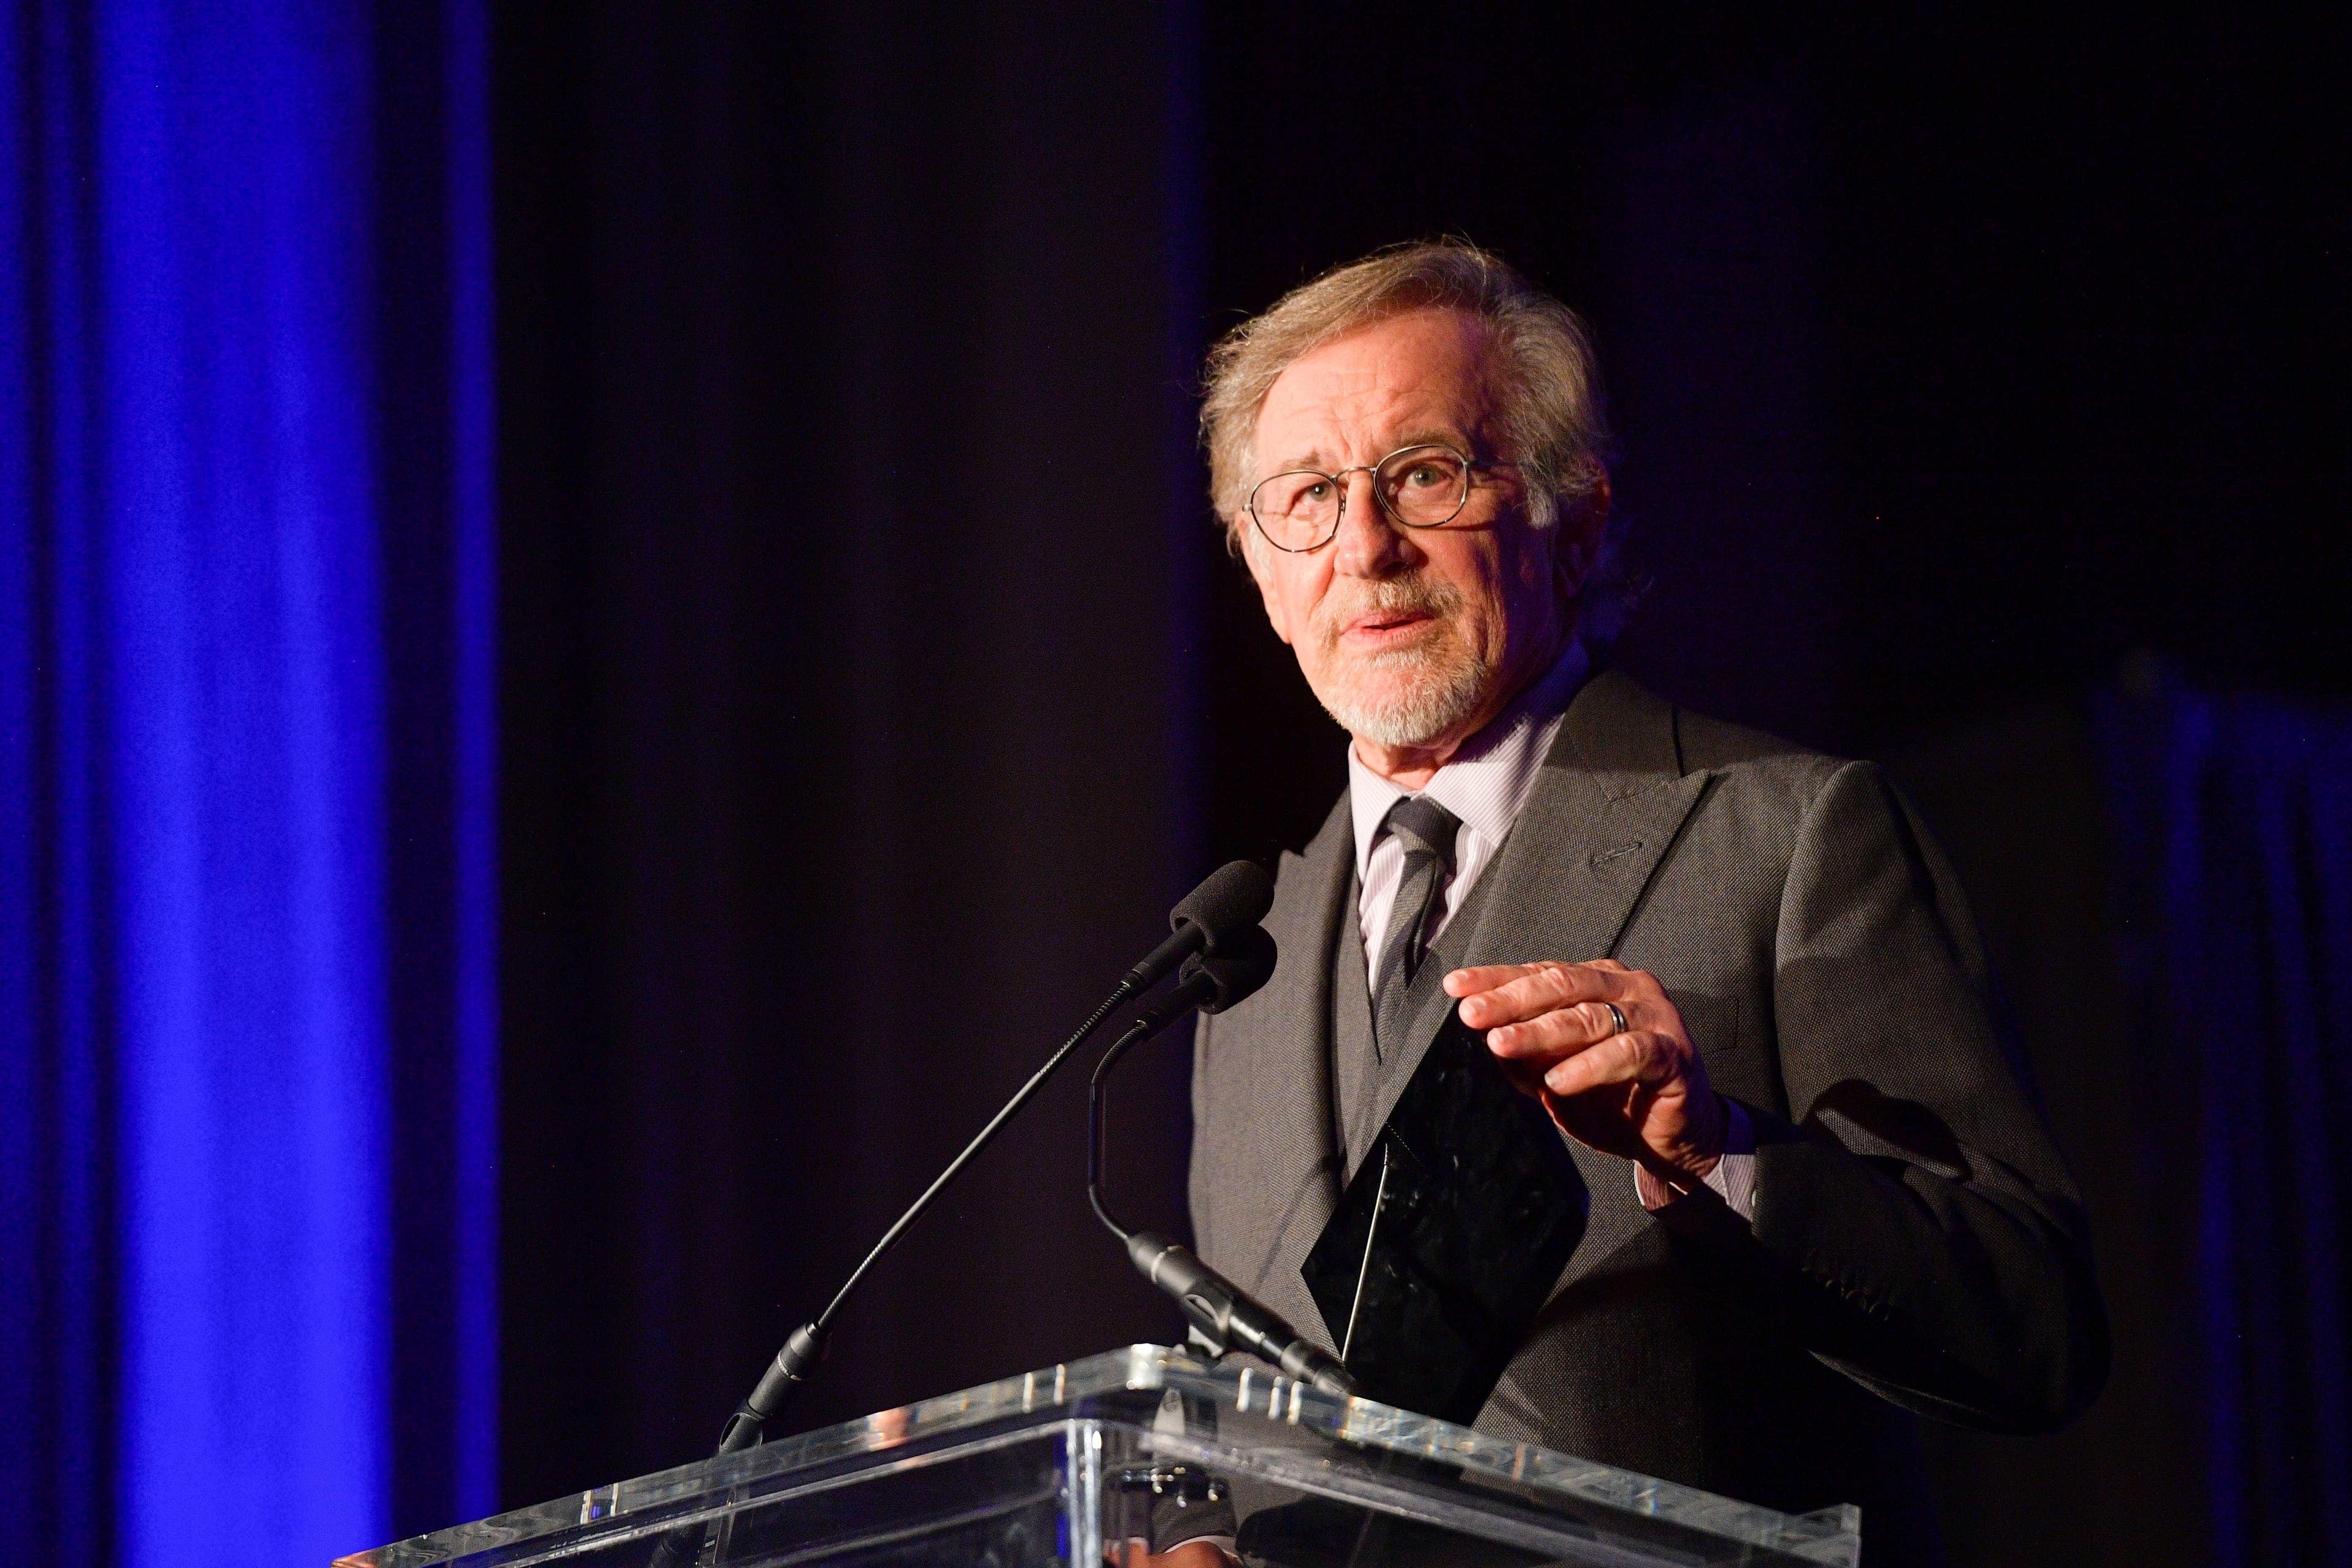 Spielberg quer afastar Netflix da corrida aos Óscares. Há quem discorde